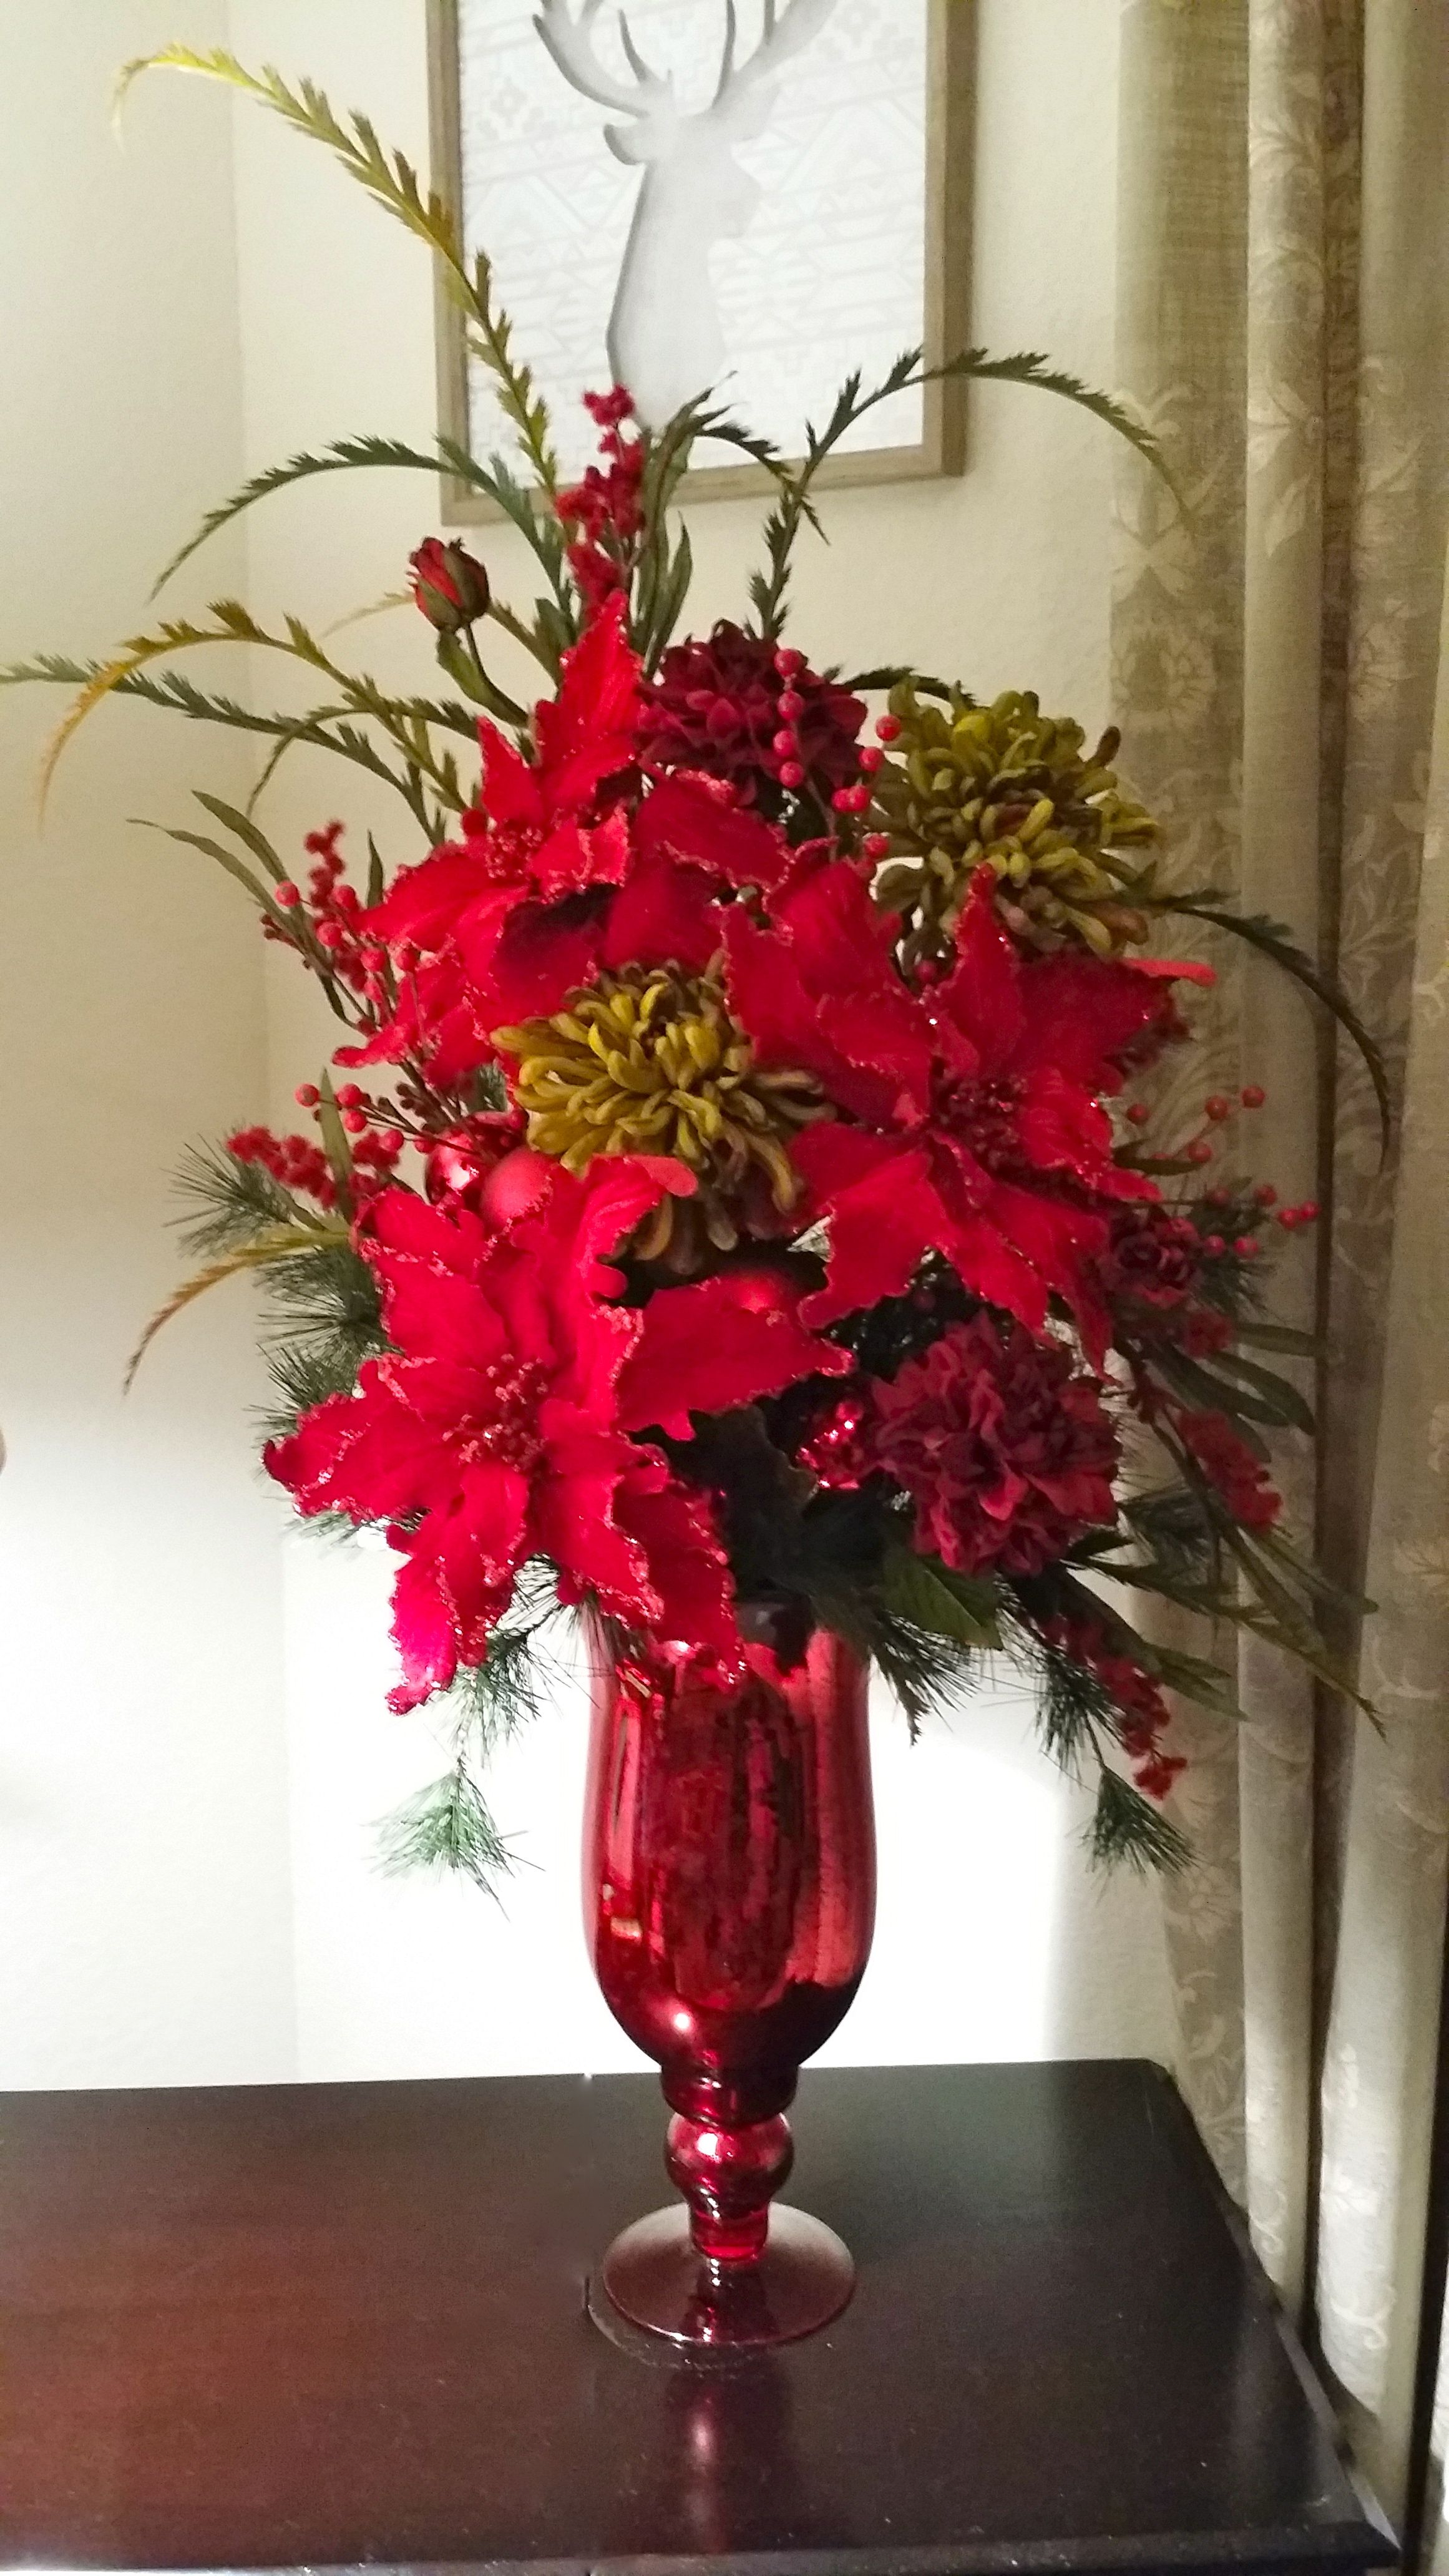 Christmas Floral Arrangement, Red Poinsettia Floral